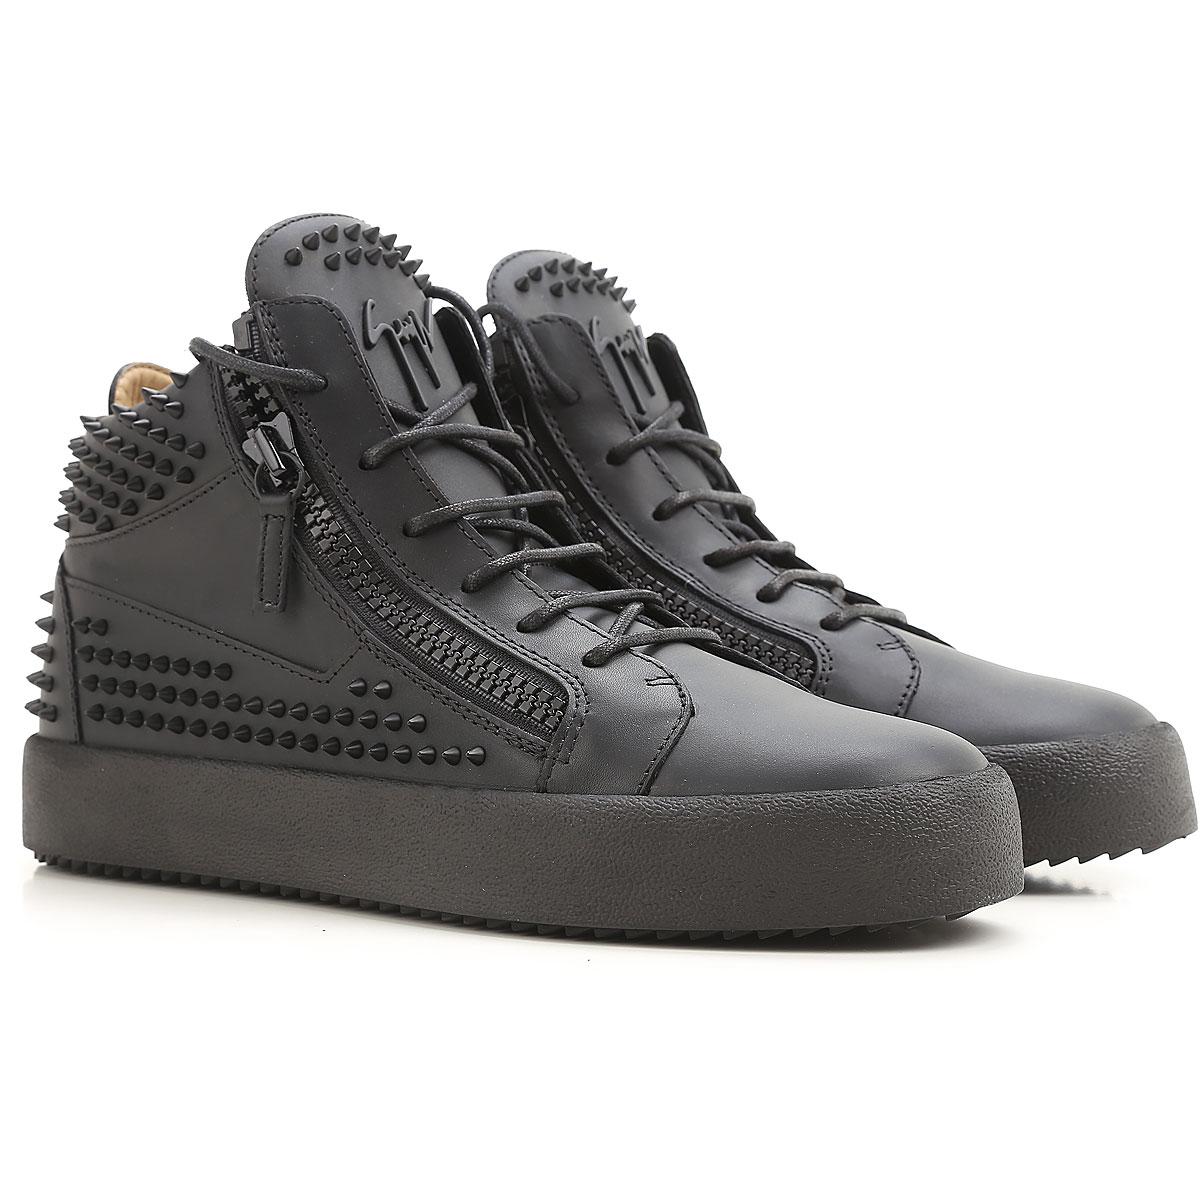 chaussures zanotti homme chaussures homme giuseppe zanotti design code produit ru70045 003